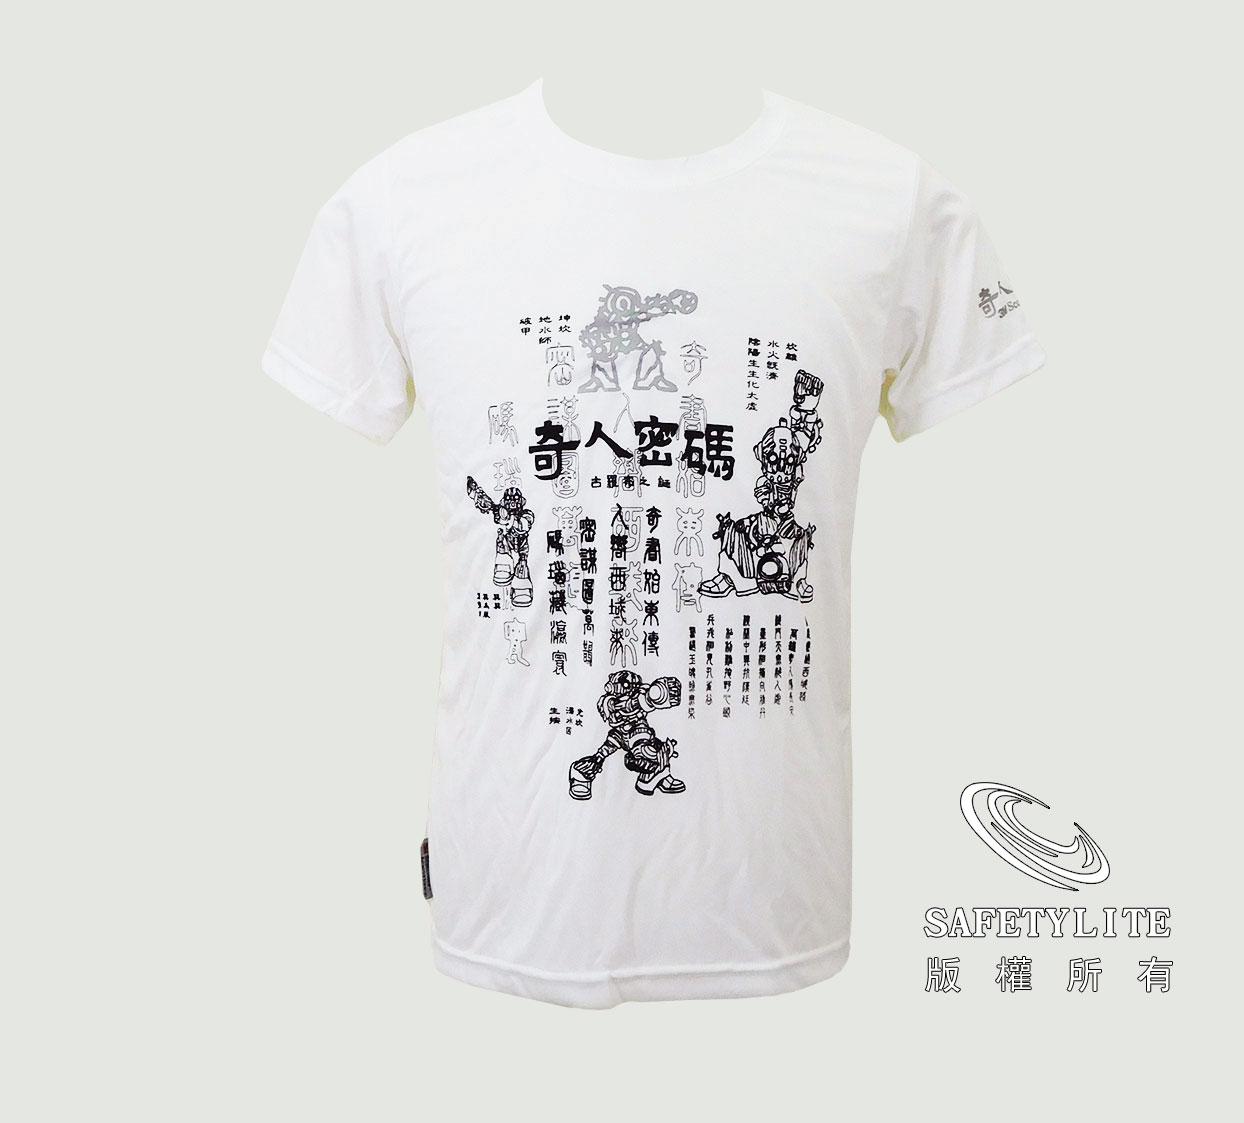 【safetylite安心生活館】《滿額899免運》印花反光機能白色短袖T恤(可團購)買二件送造型束口袋-3M Scotchlite?反光